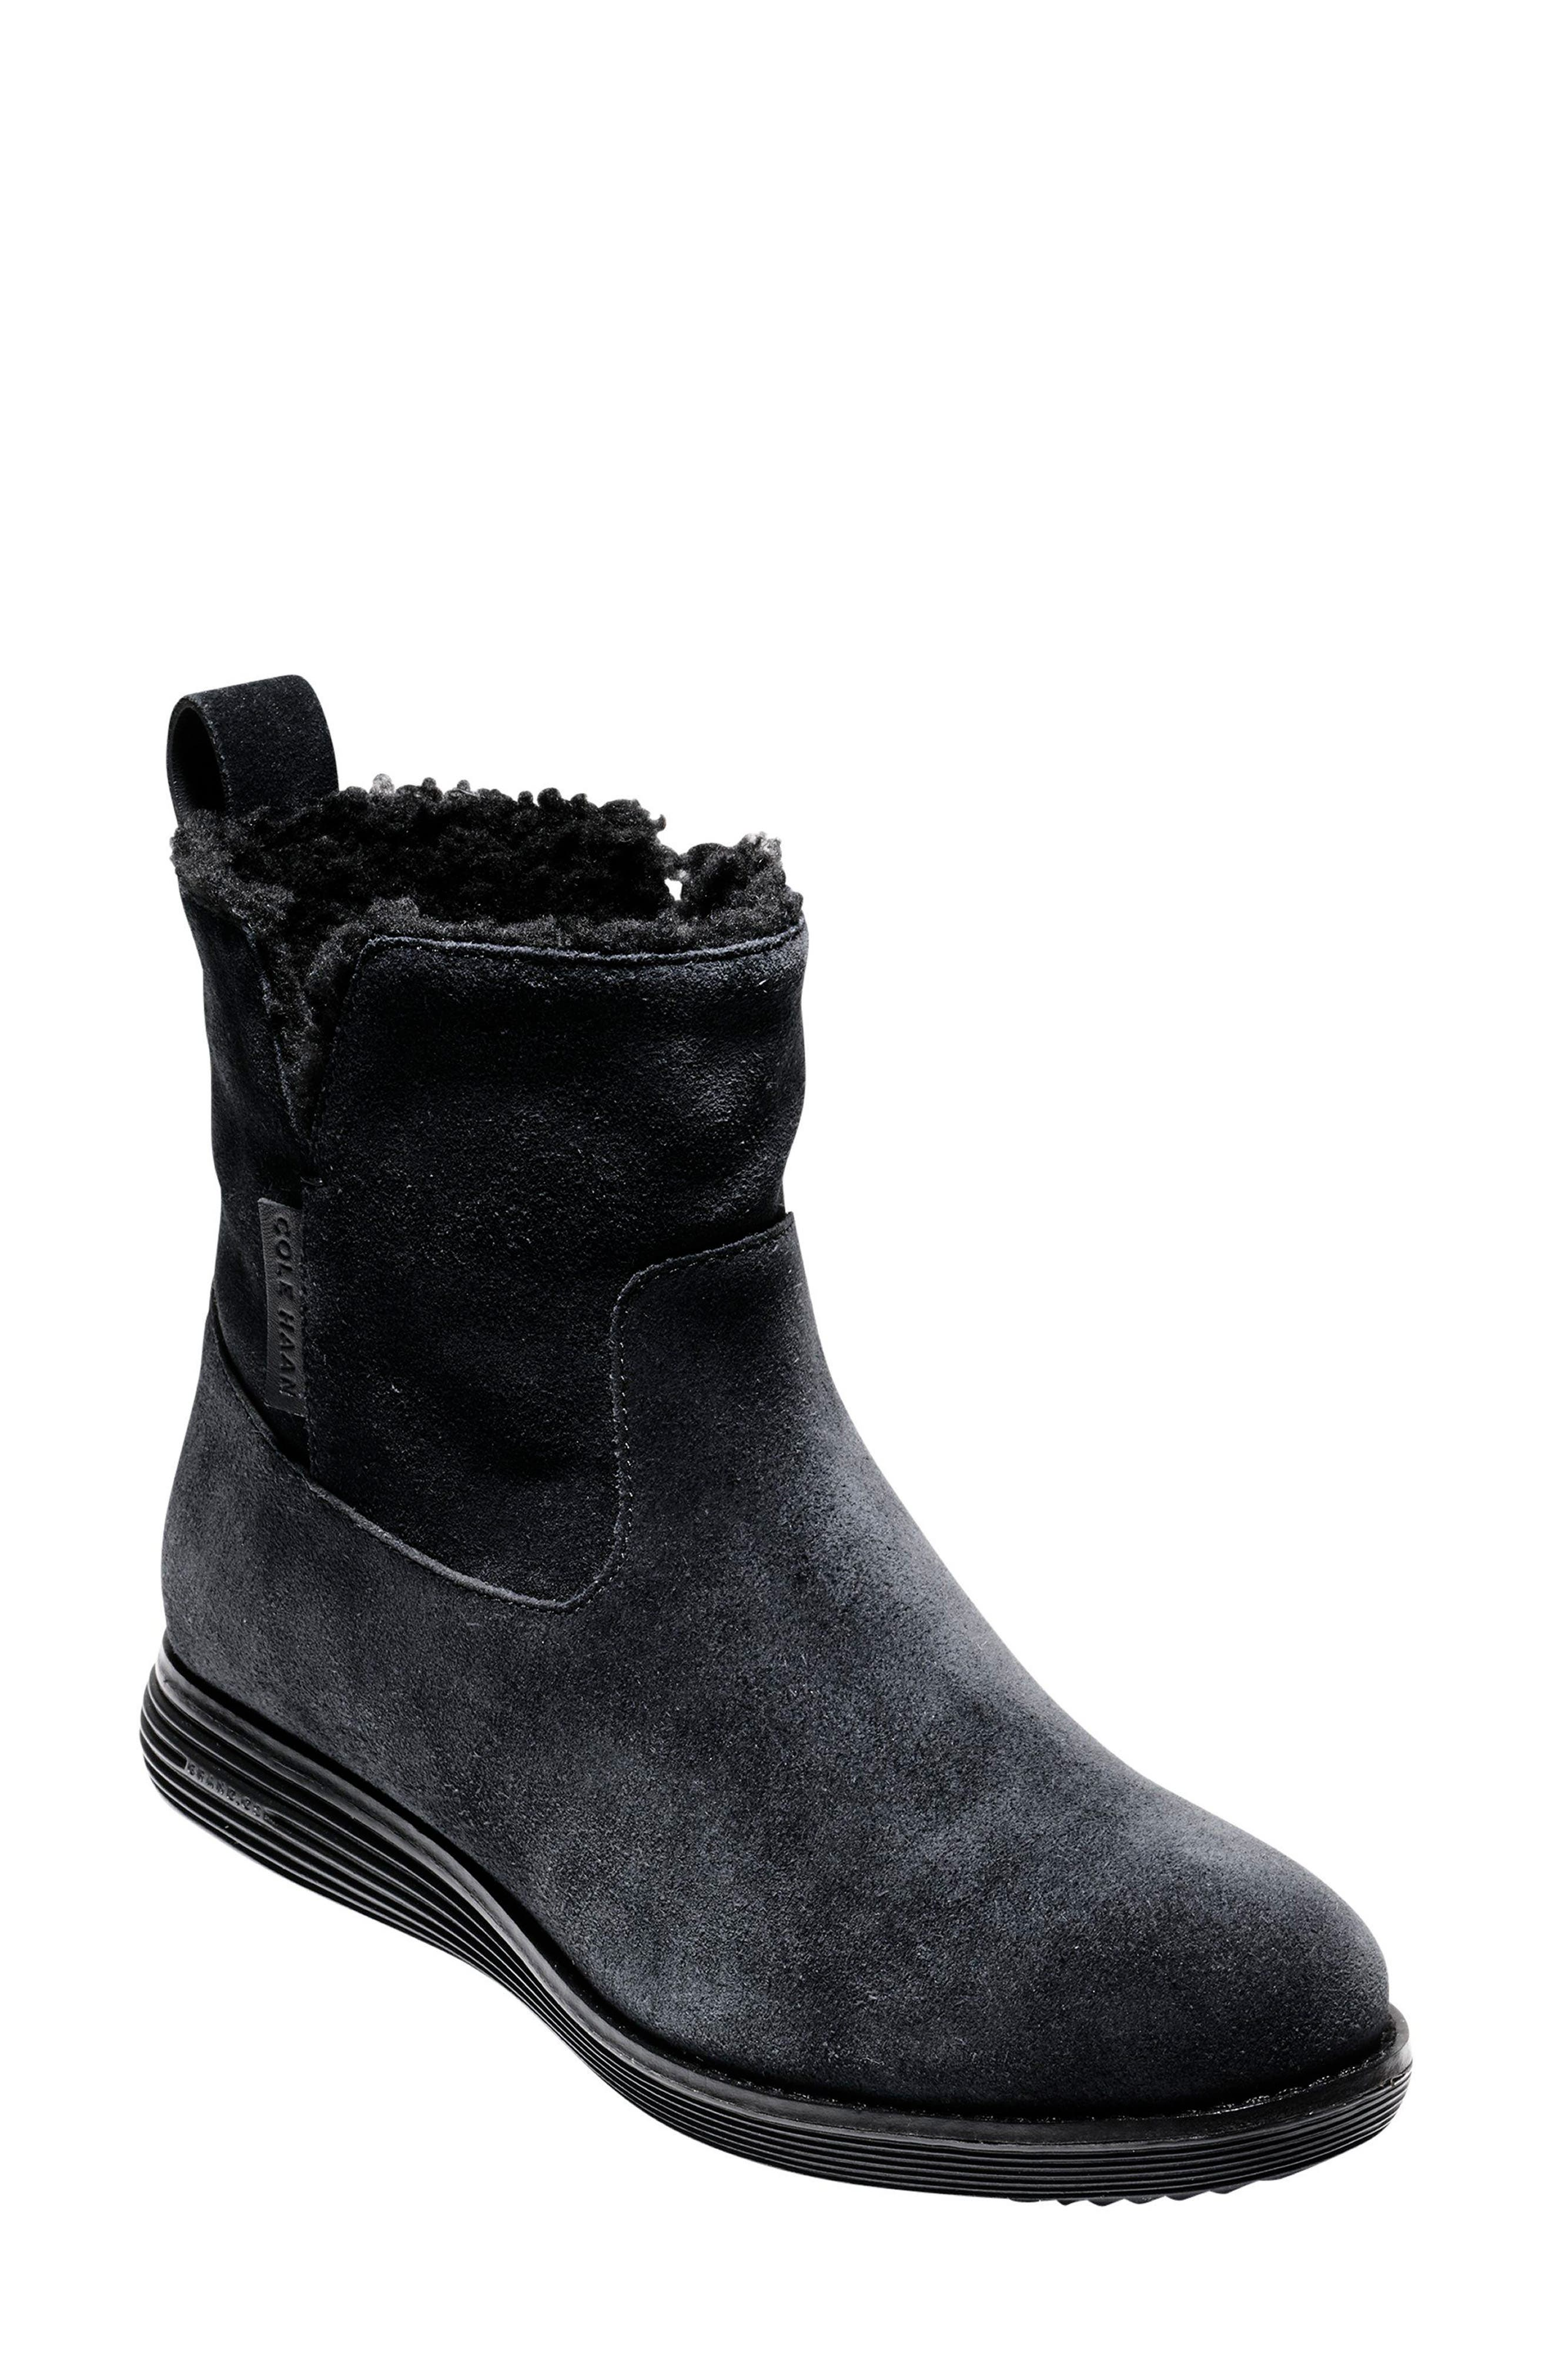 Original Grand Weatherproof Boot,                         Main,                         color, Black Suede